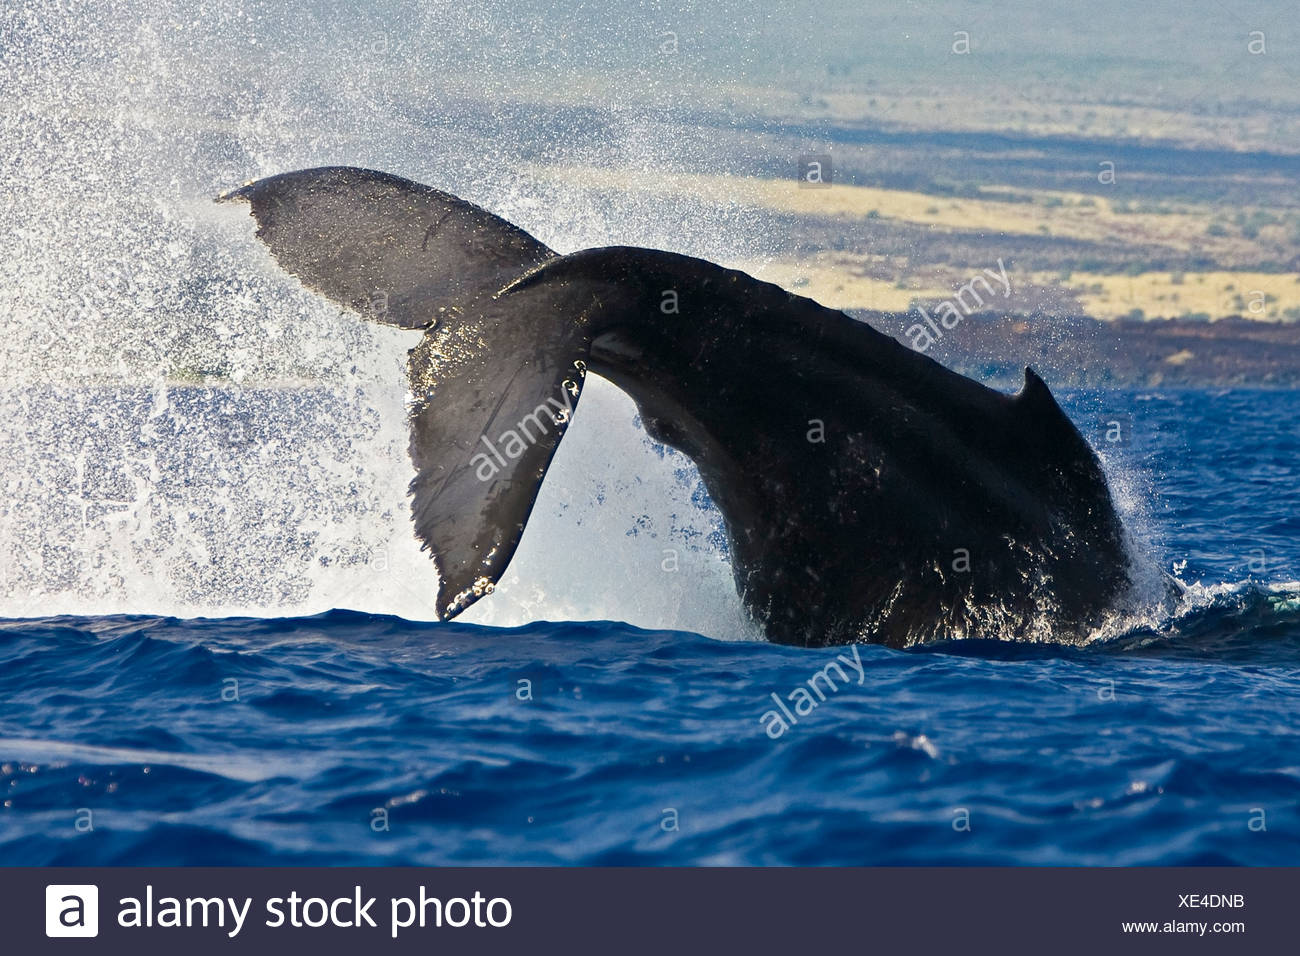 Ende der Buckelwal, Impressionen Novaeangliae, Kona Coast, Big Island, Hawaii, USA Stockbild